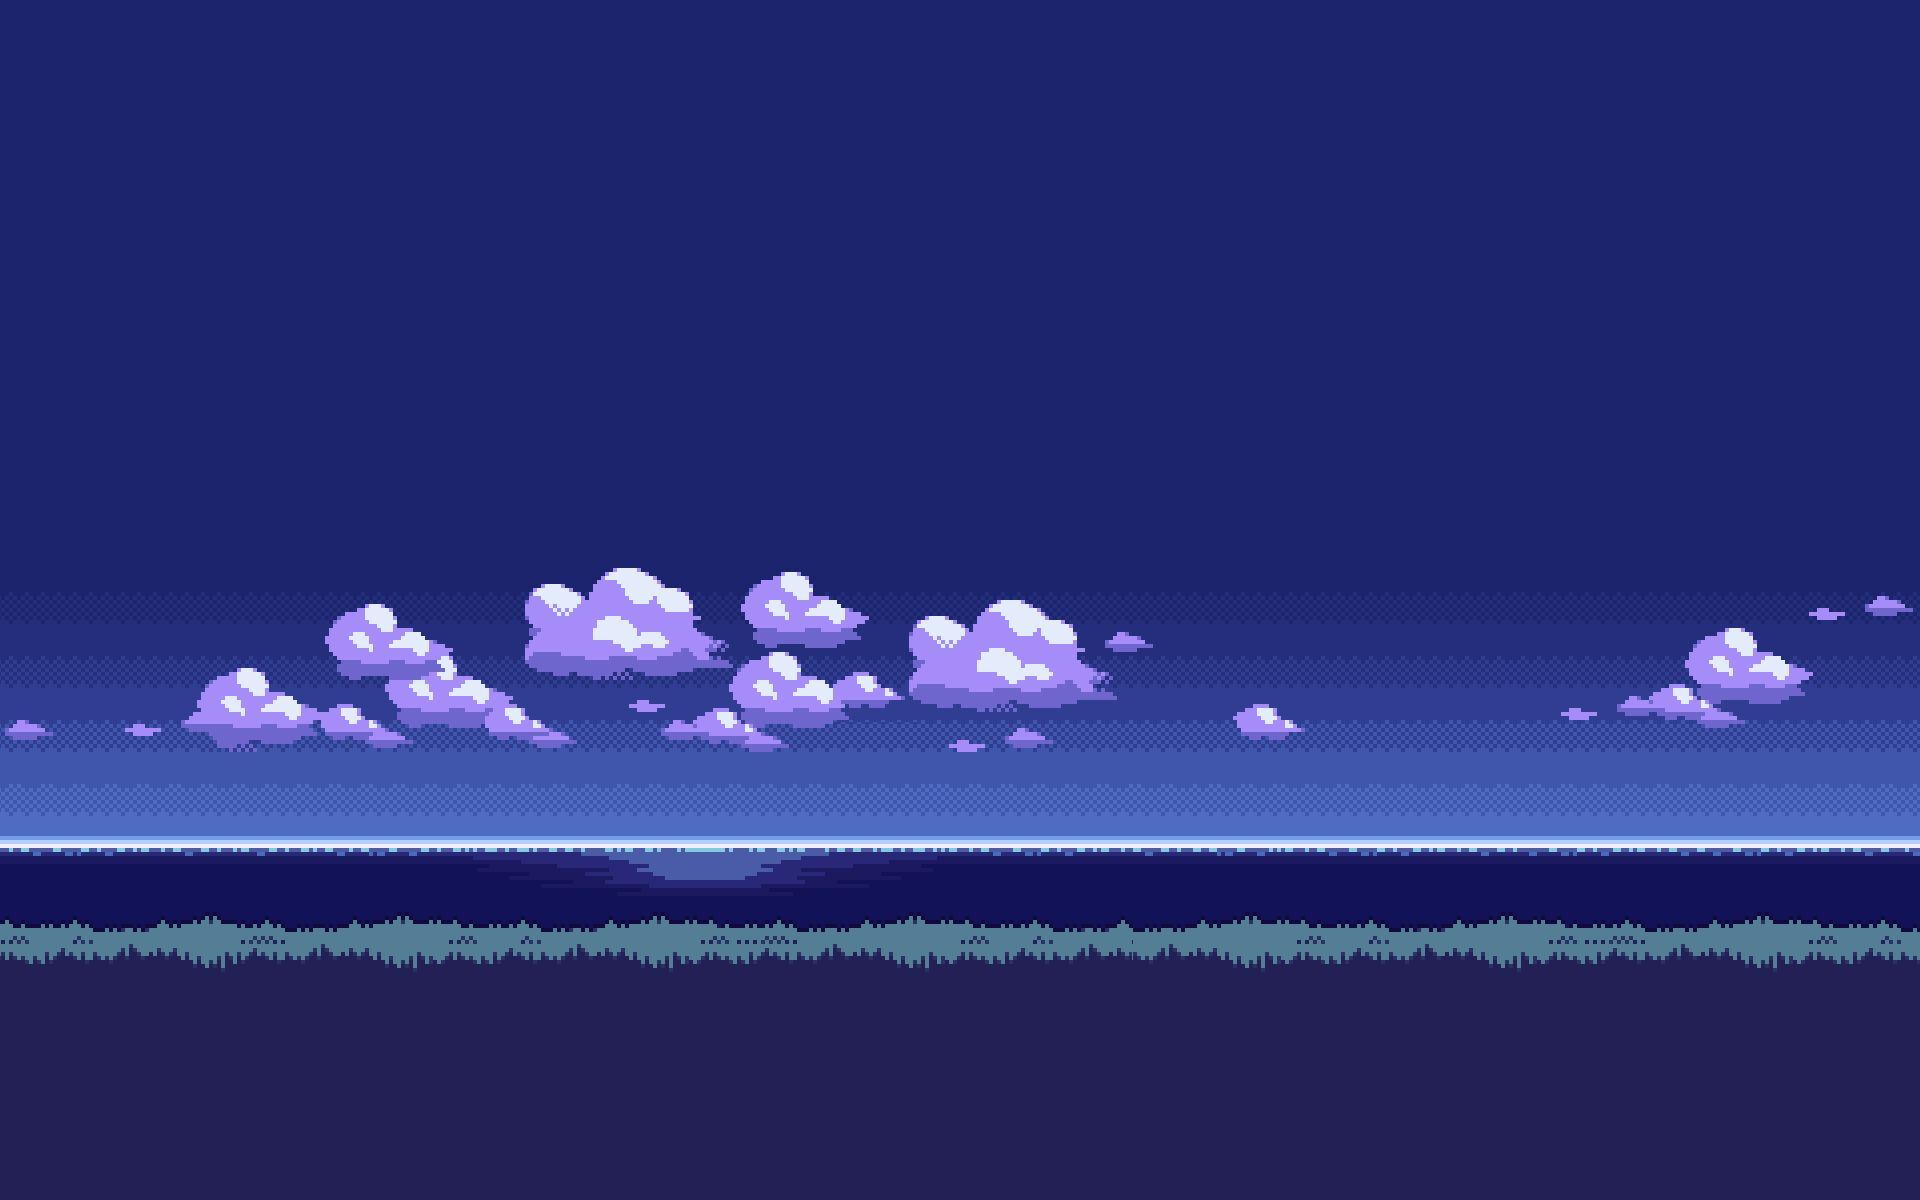 8bit Sky Night Pixel Art Desktop Wallpaper Art Wallpaper